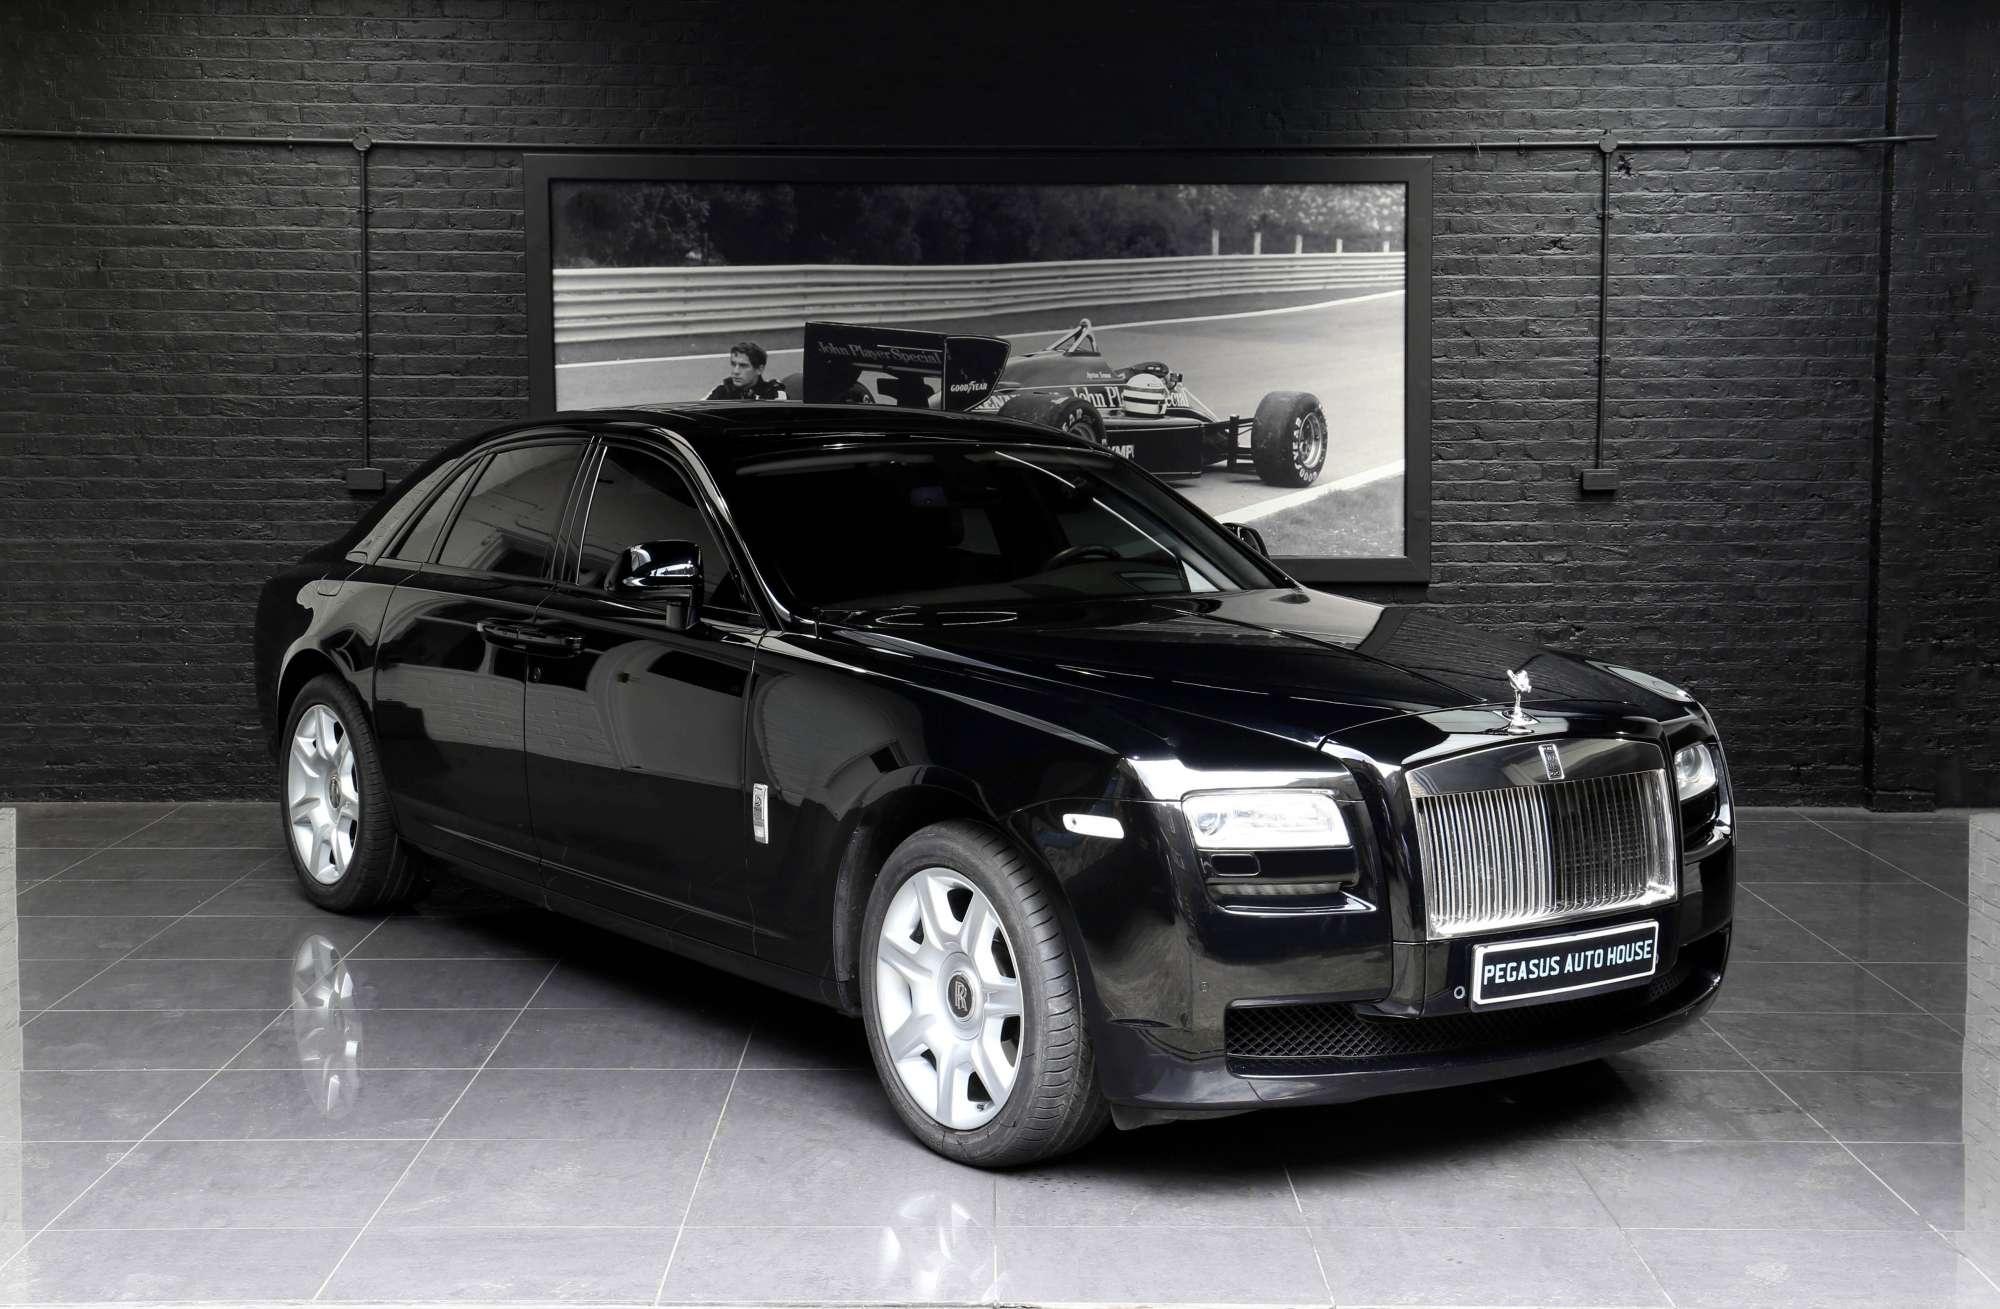 Diamond Auto Sales >> Rolls-Royce Ghost - Pegasus Auto House